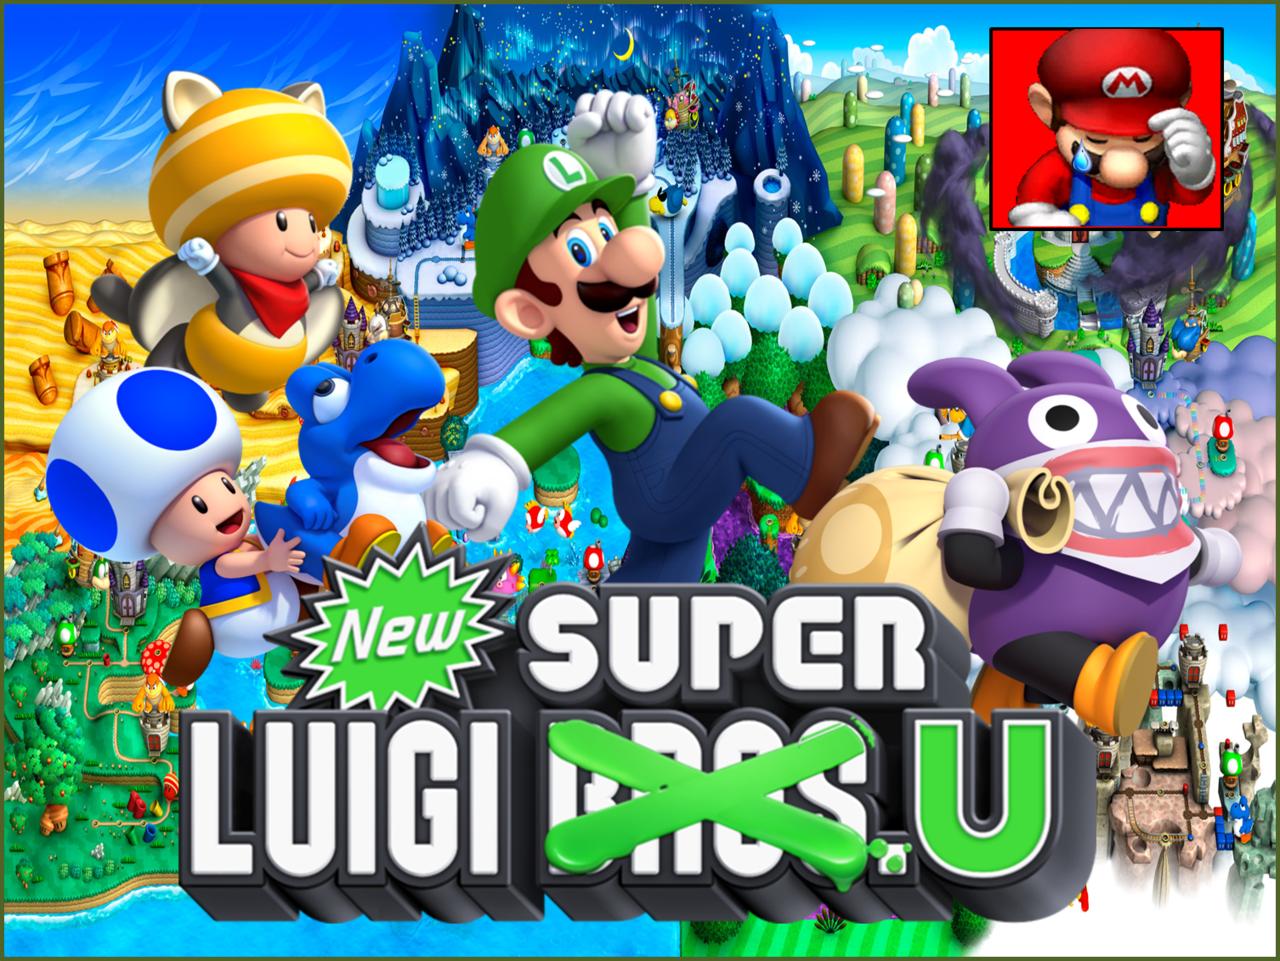 réserver New Super Luigi U